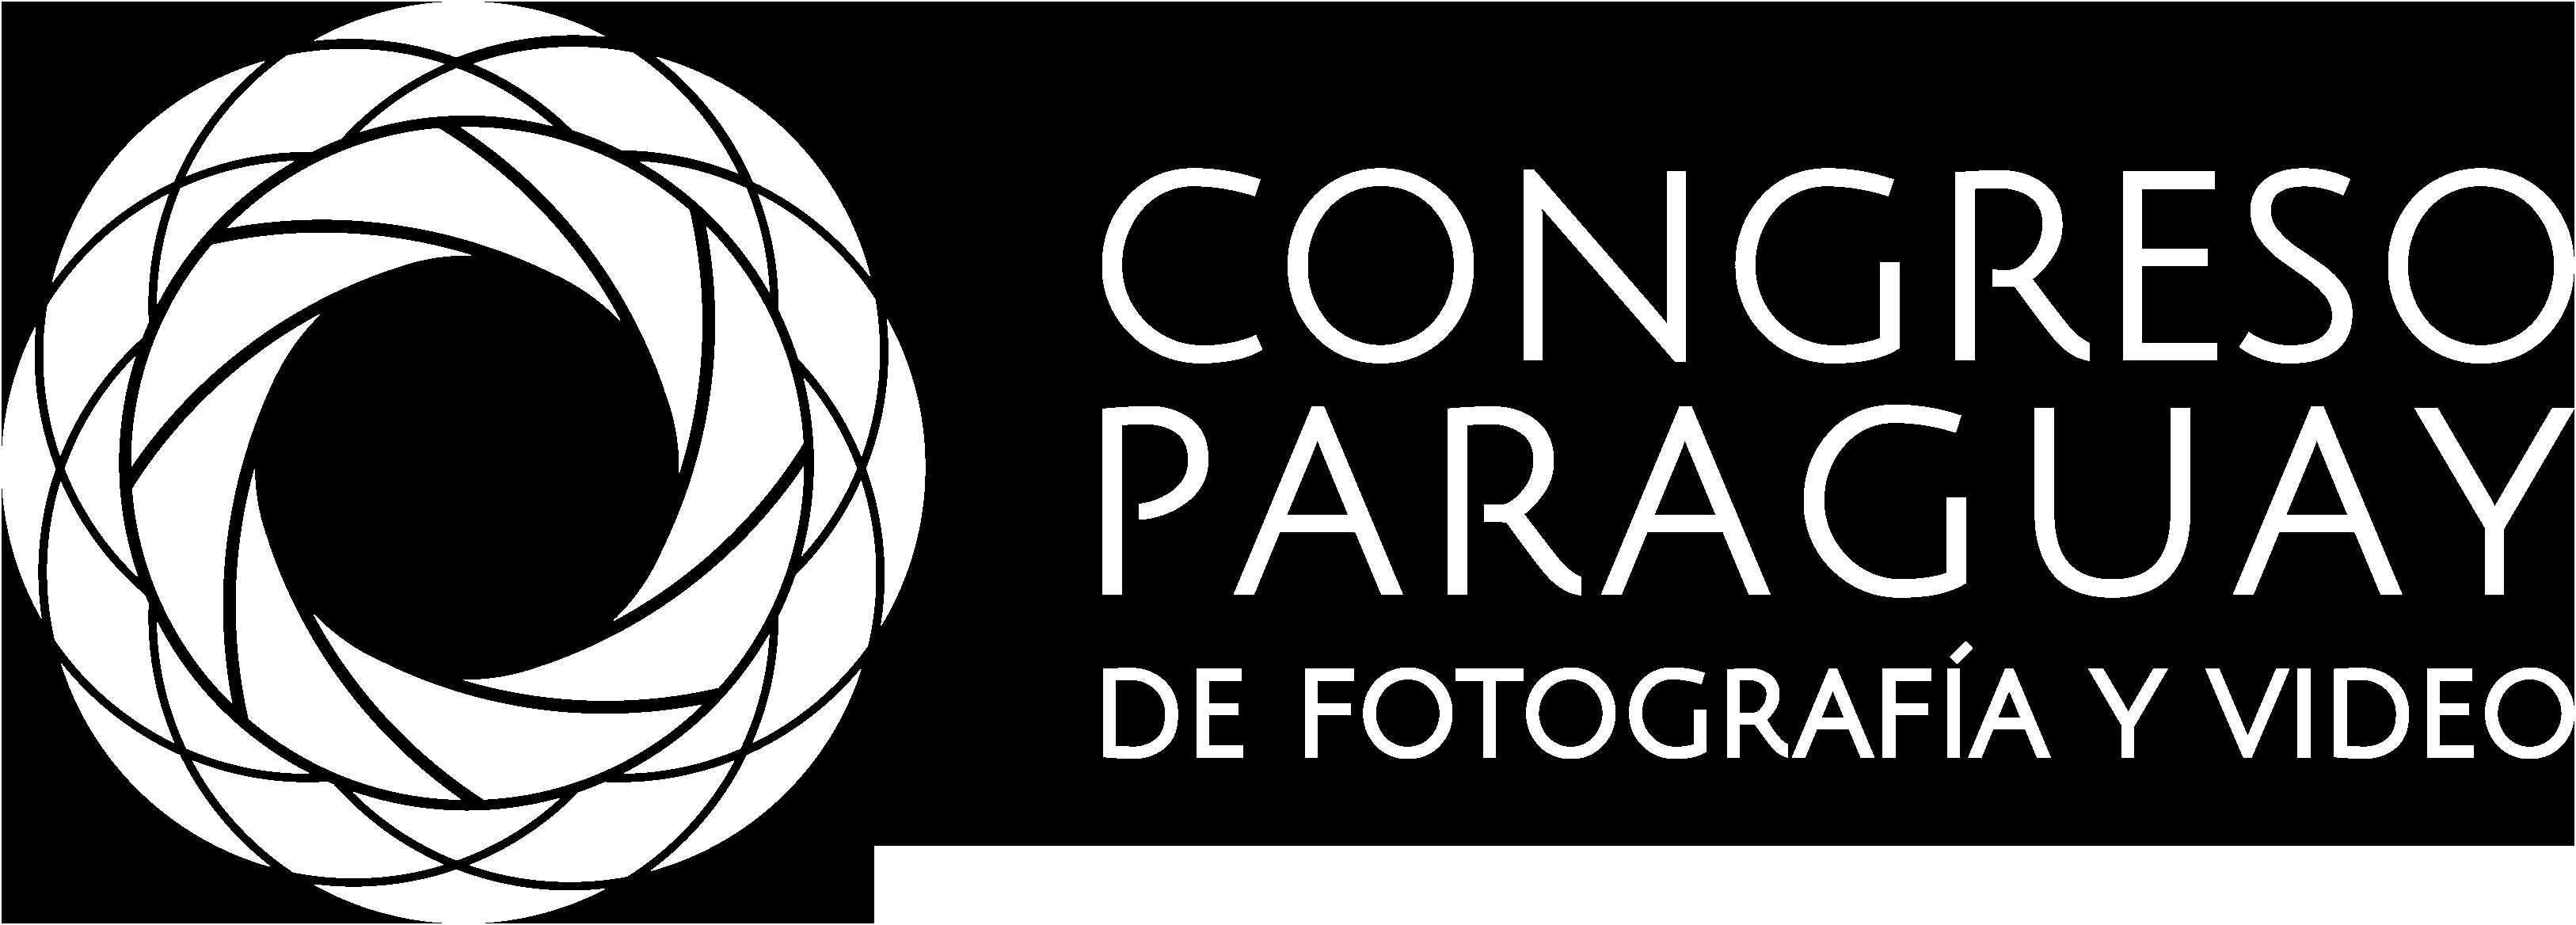 logo congreso paraguay branco 1516364721  fotografo